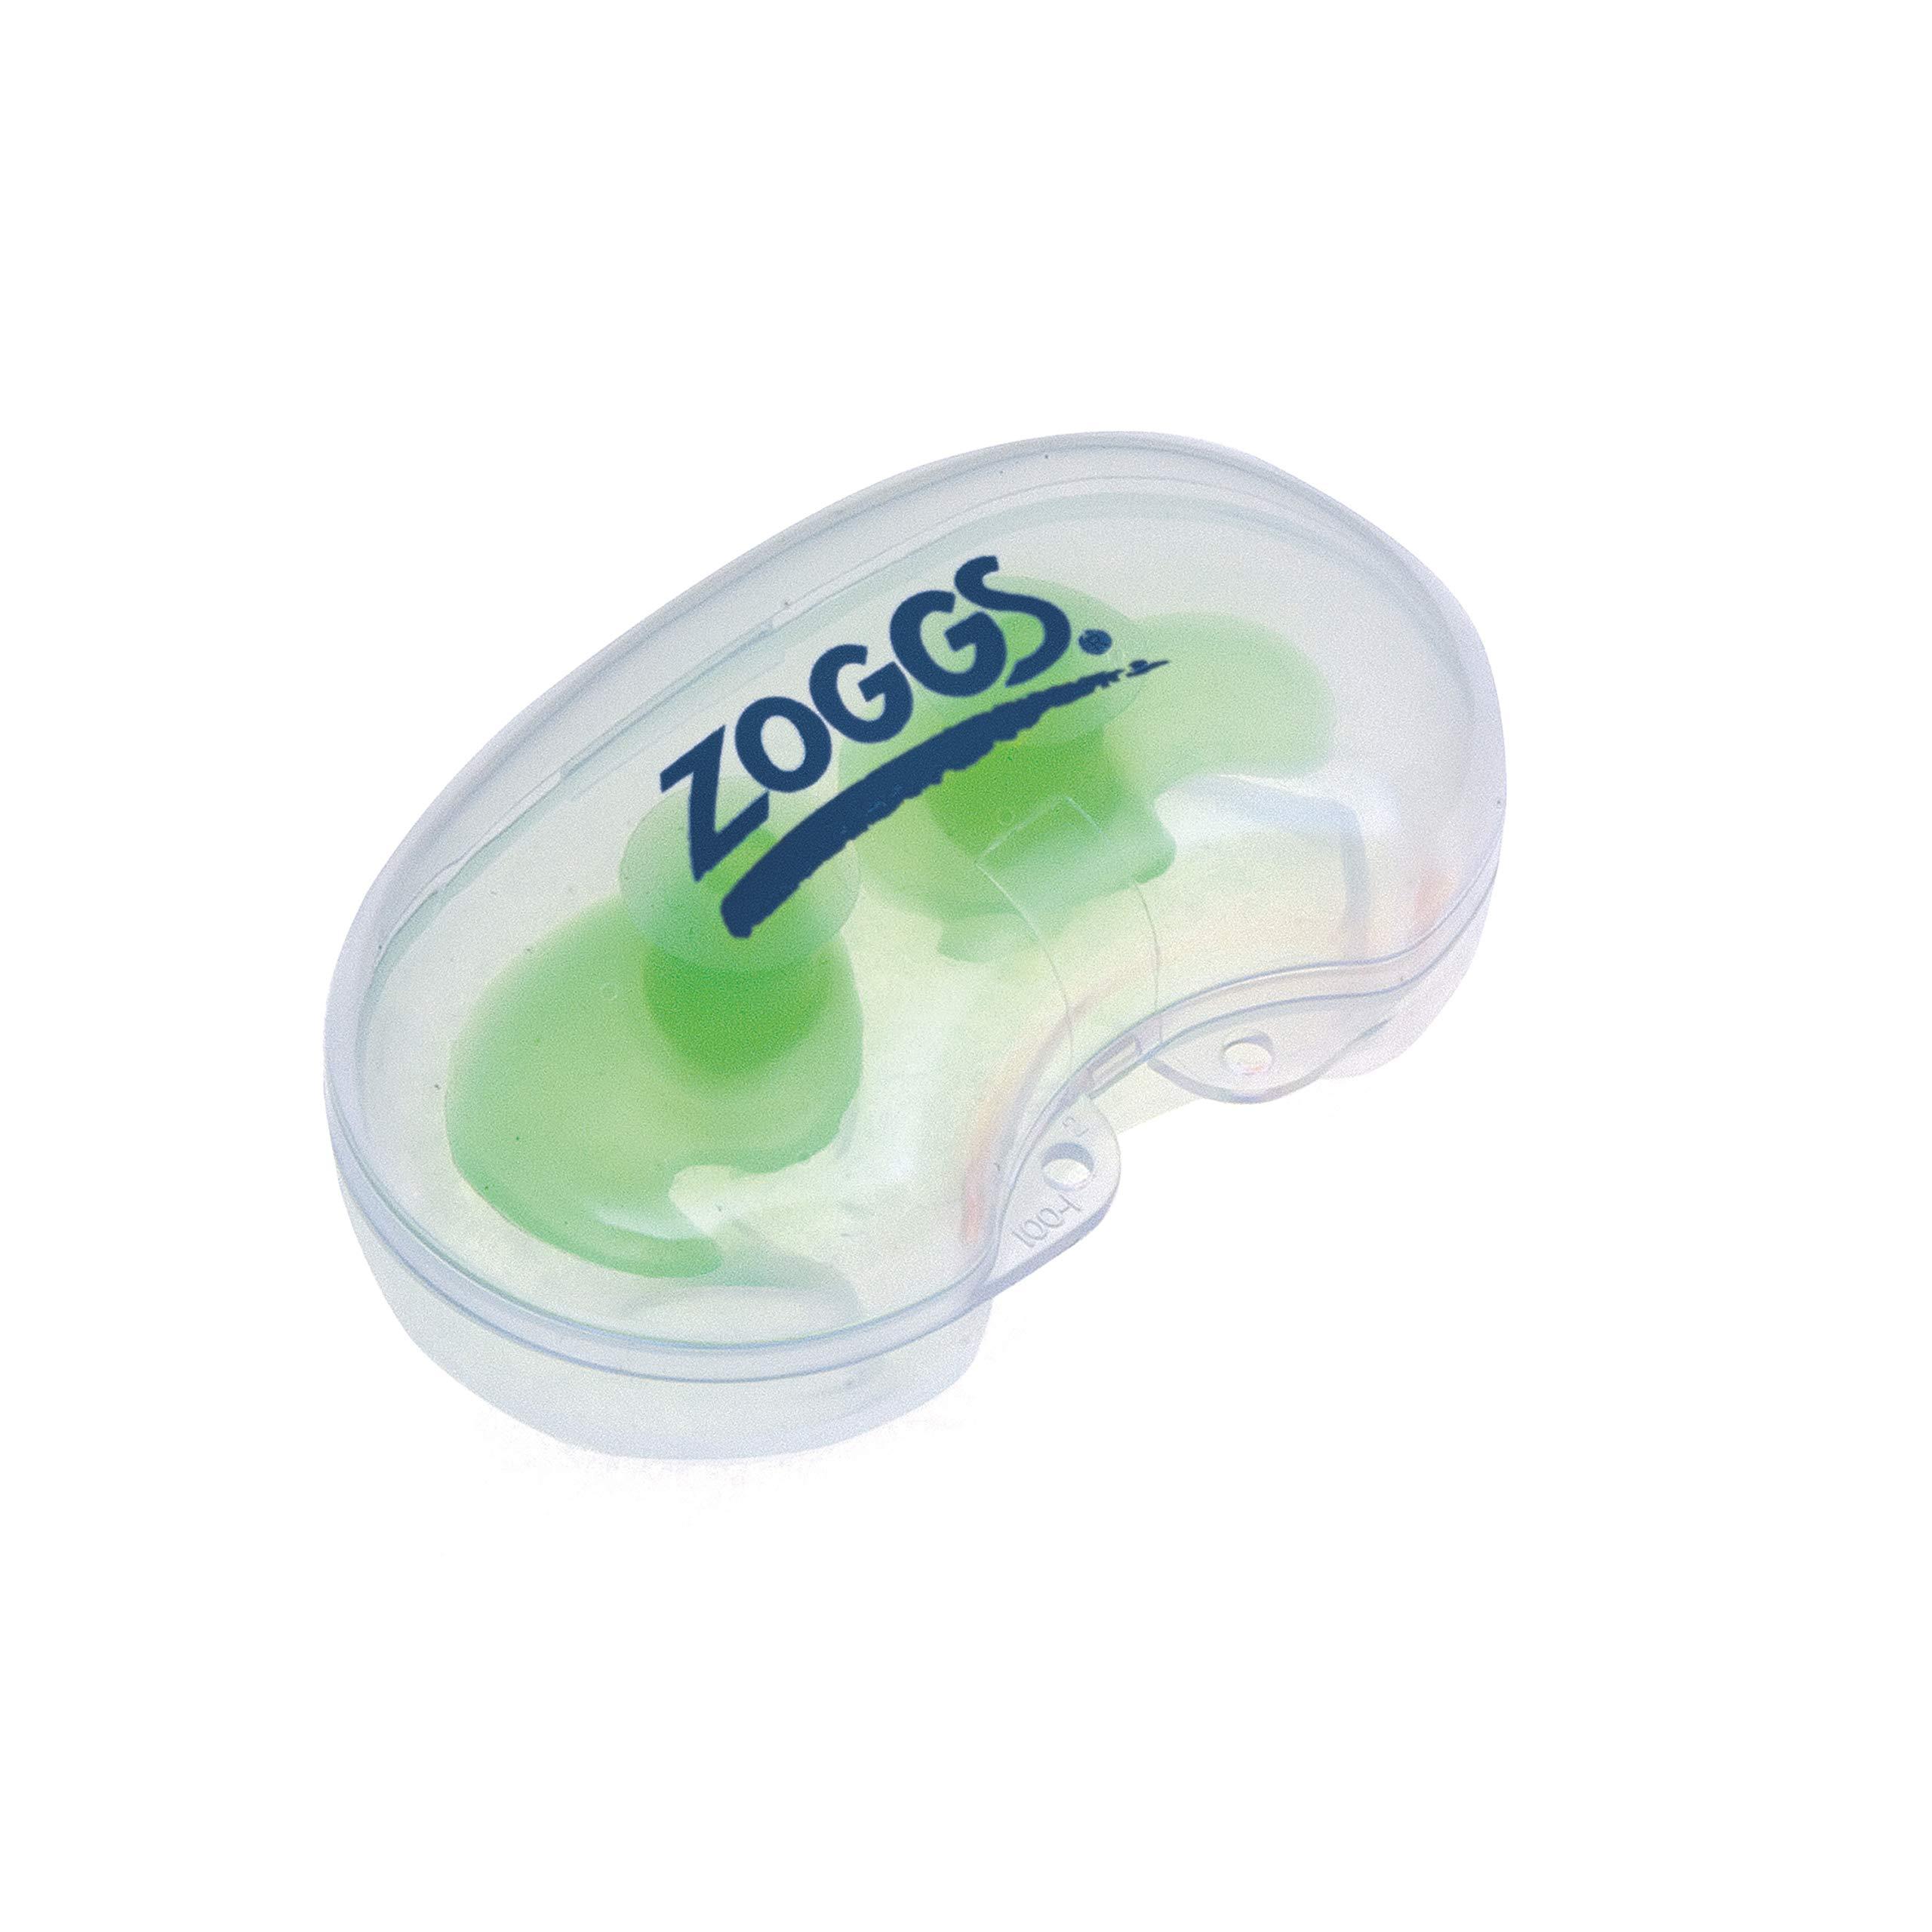 Zoggs Aqua Plugz, Ear Plugs for Swimming, Reusable Silicone Ear Plugs